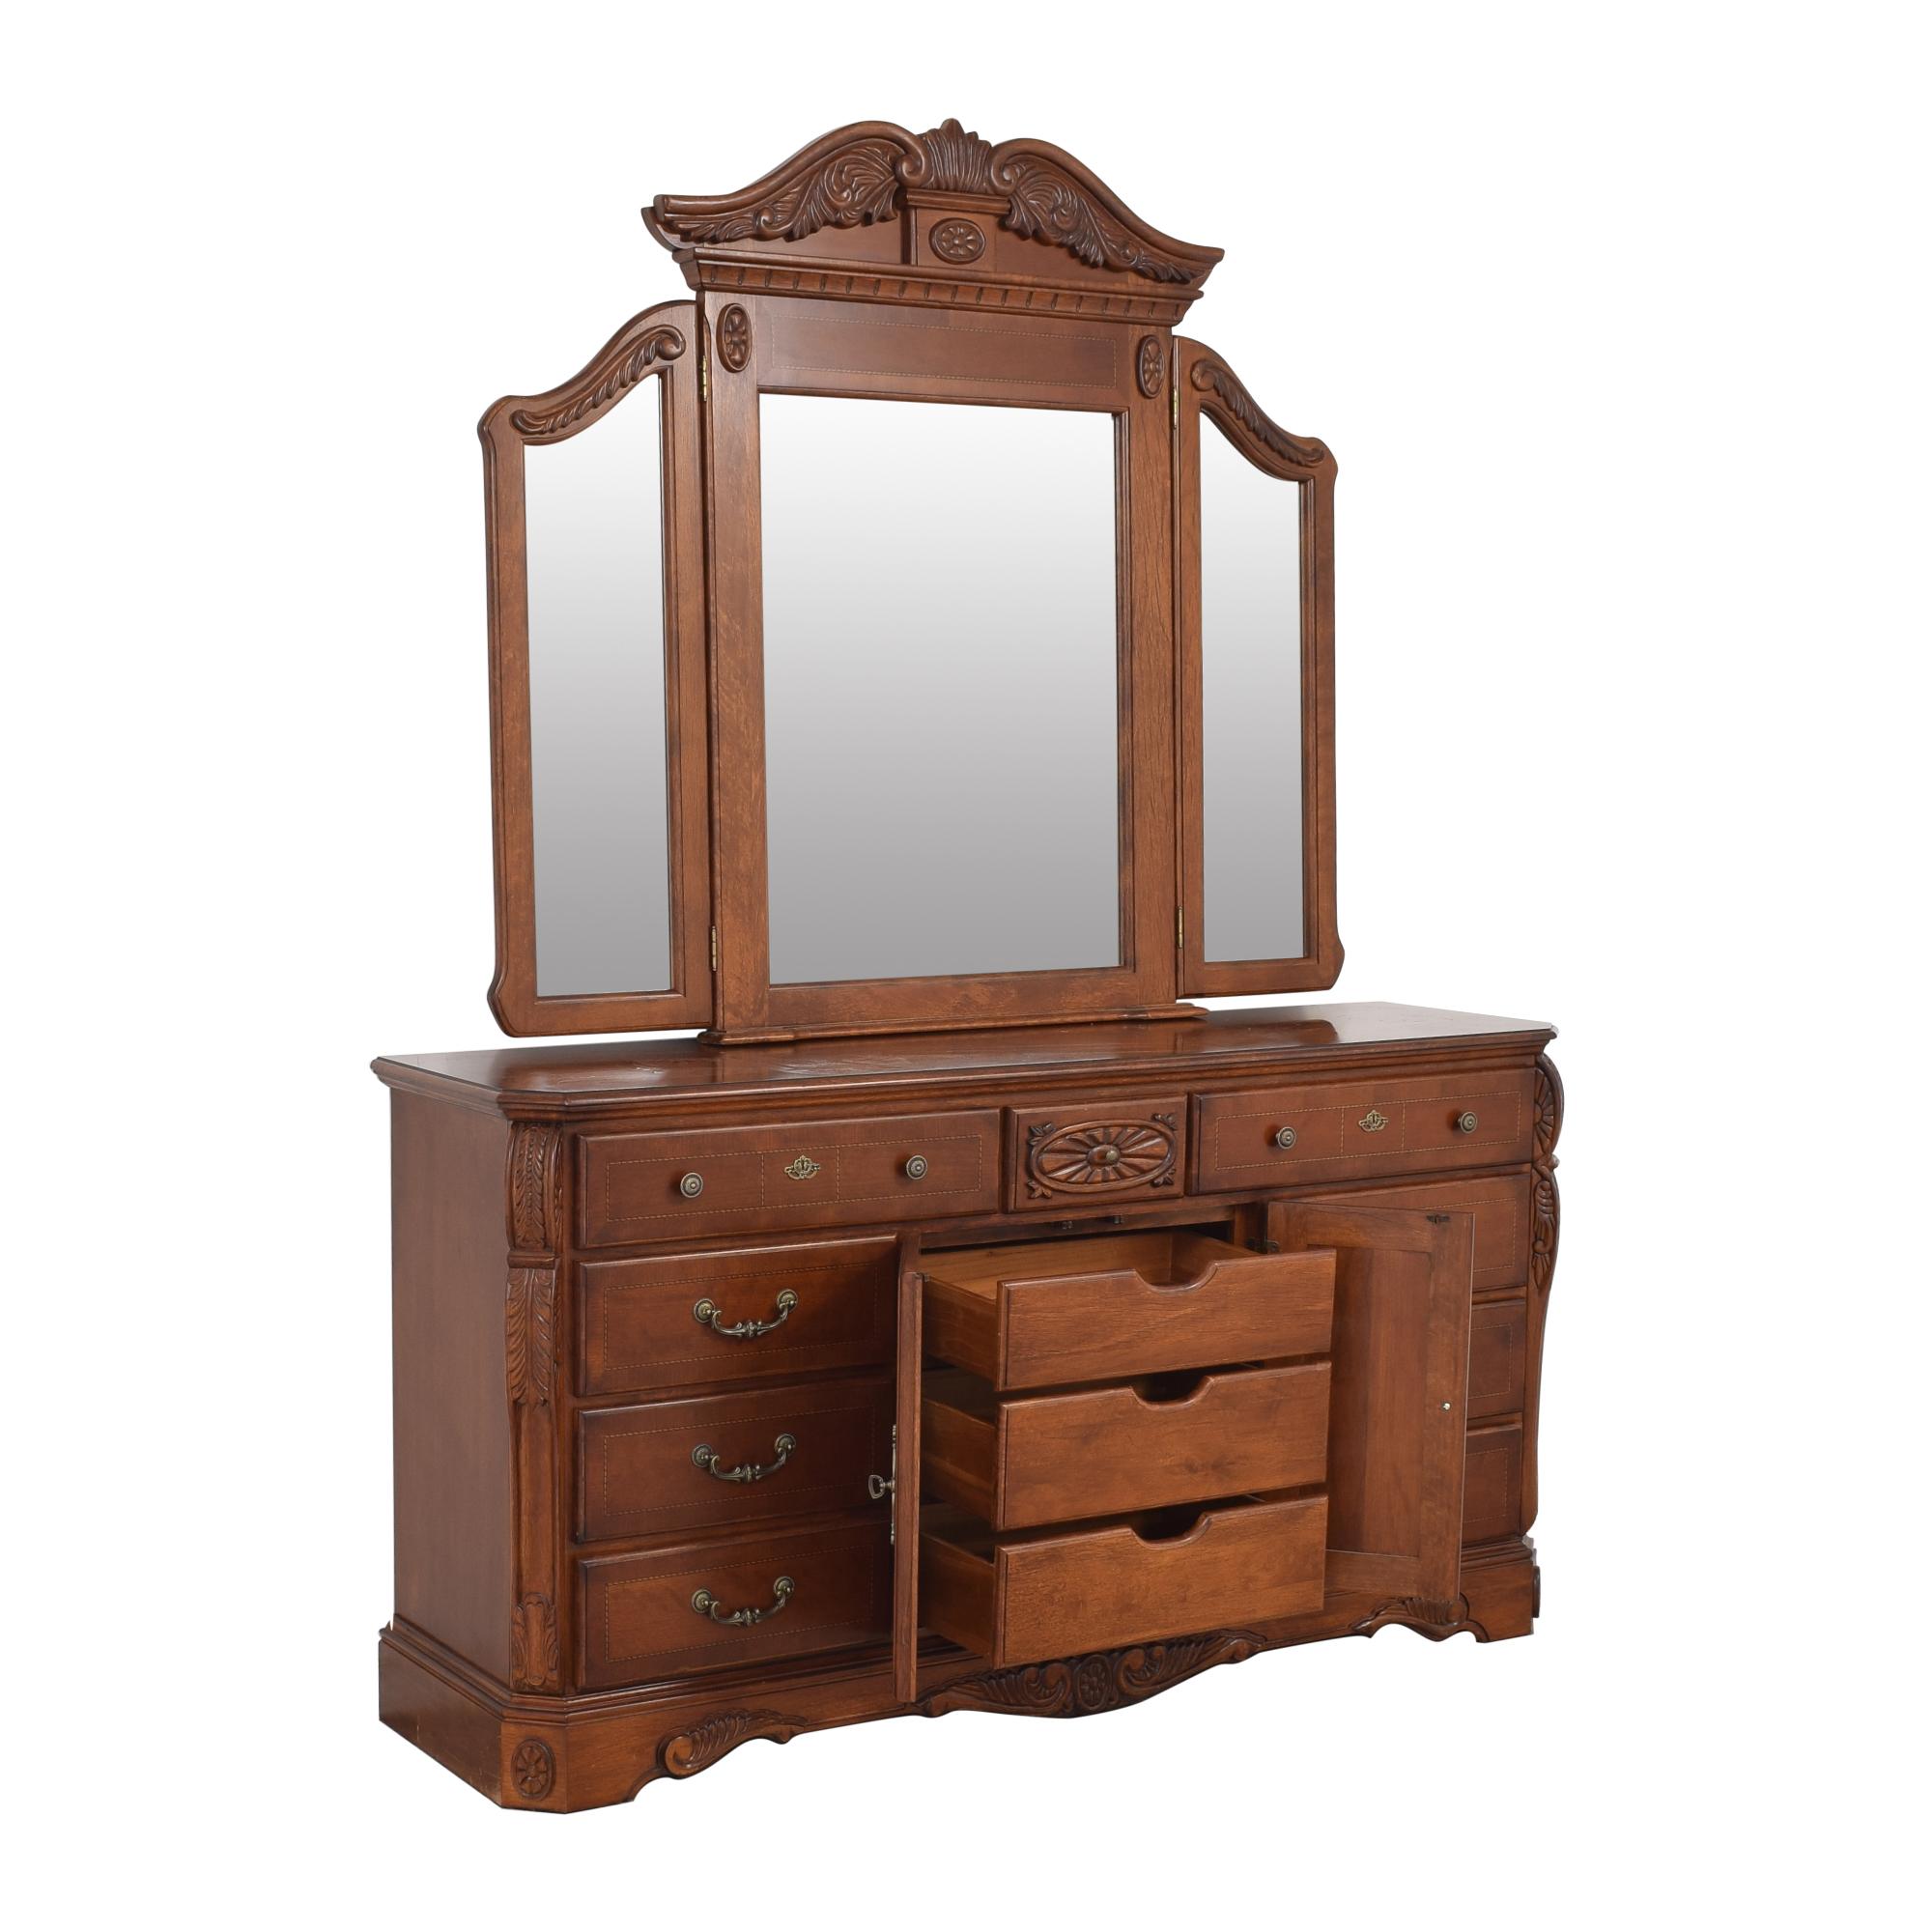 Dresser with Tri Fold Mirror second hand